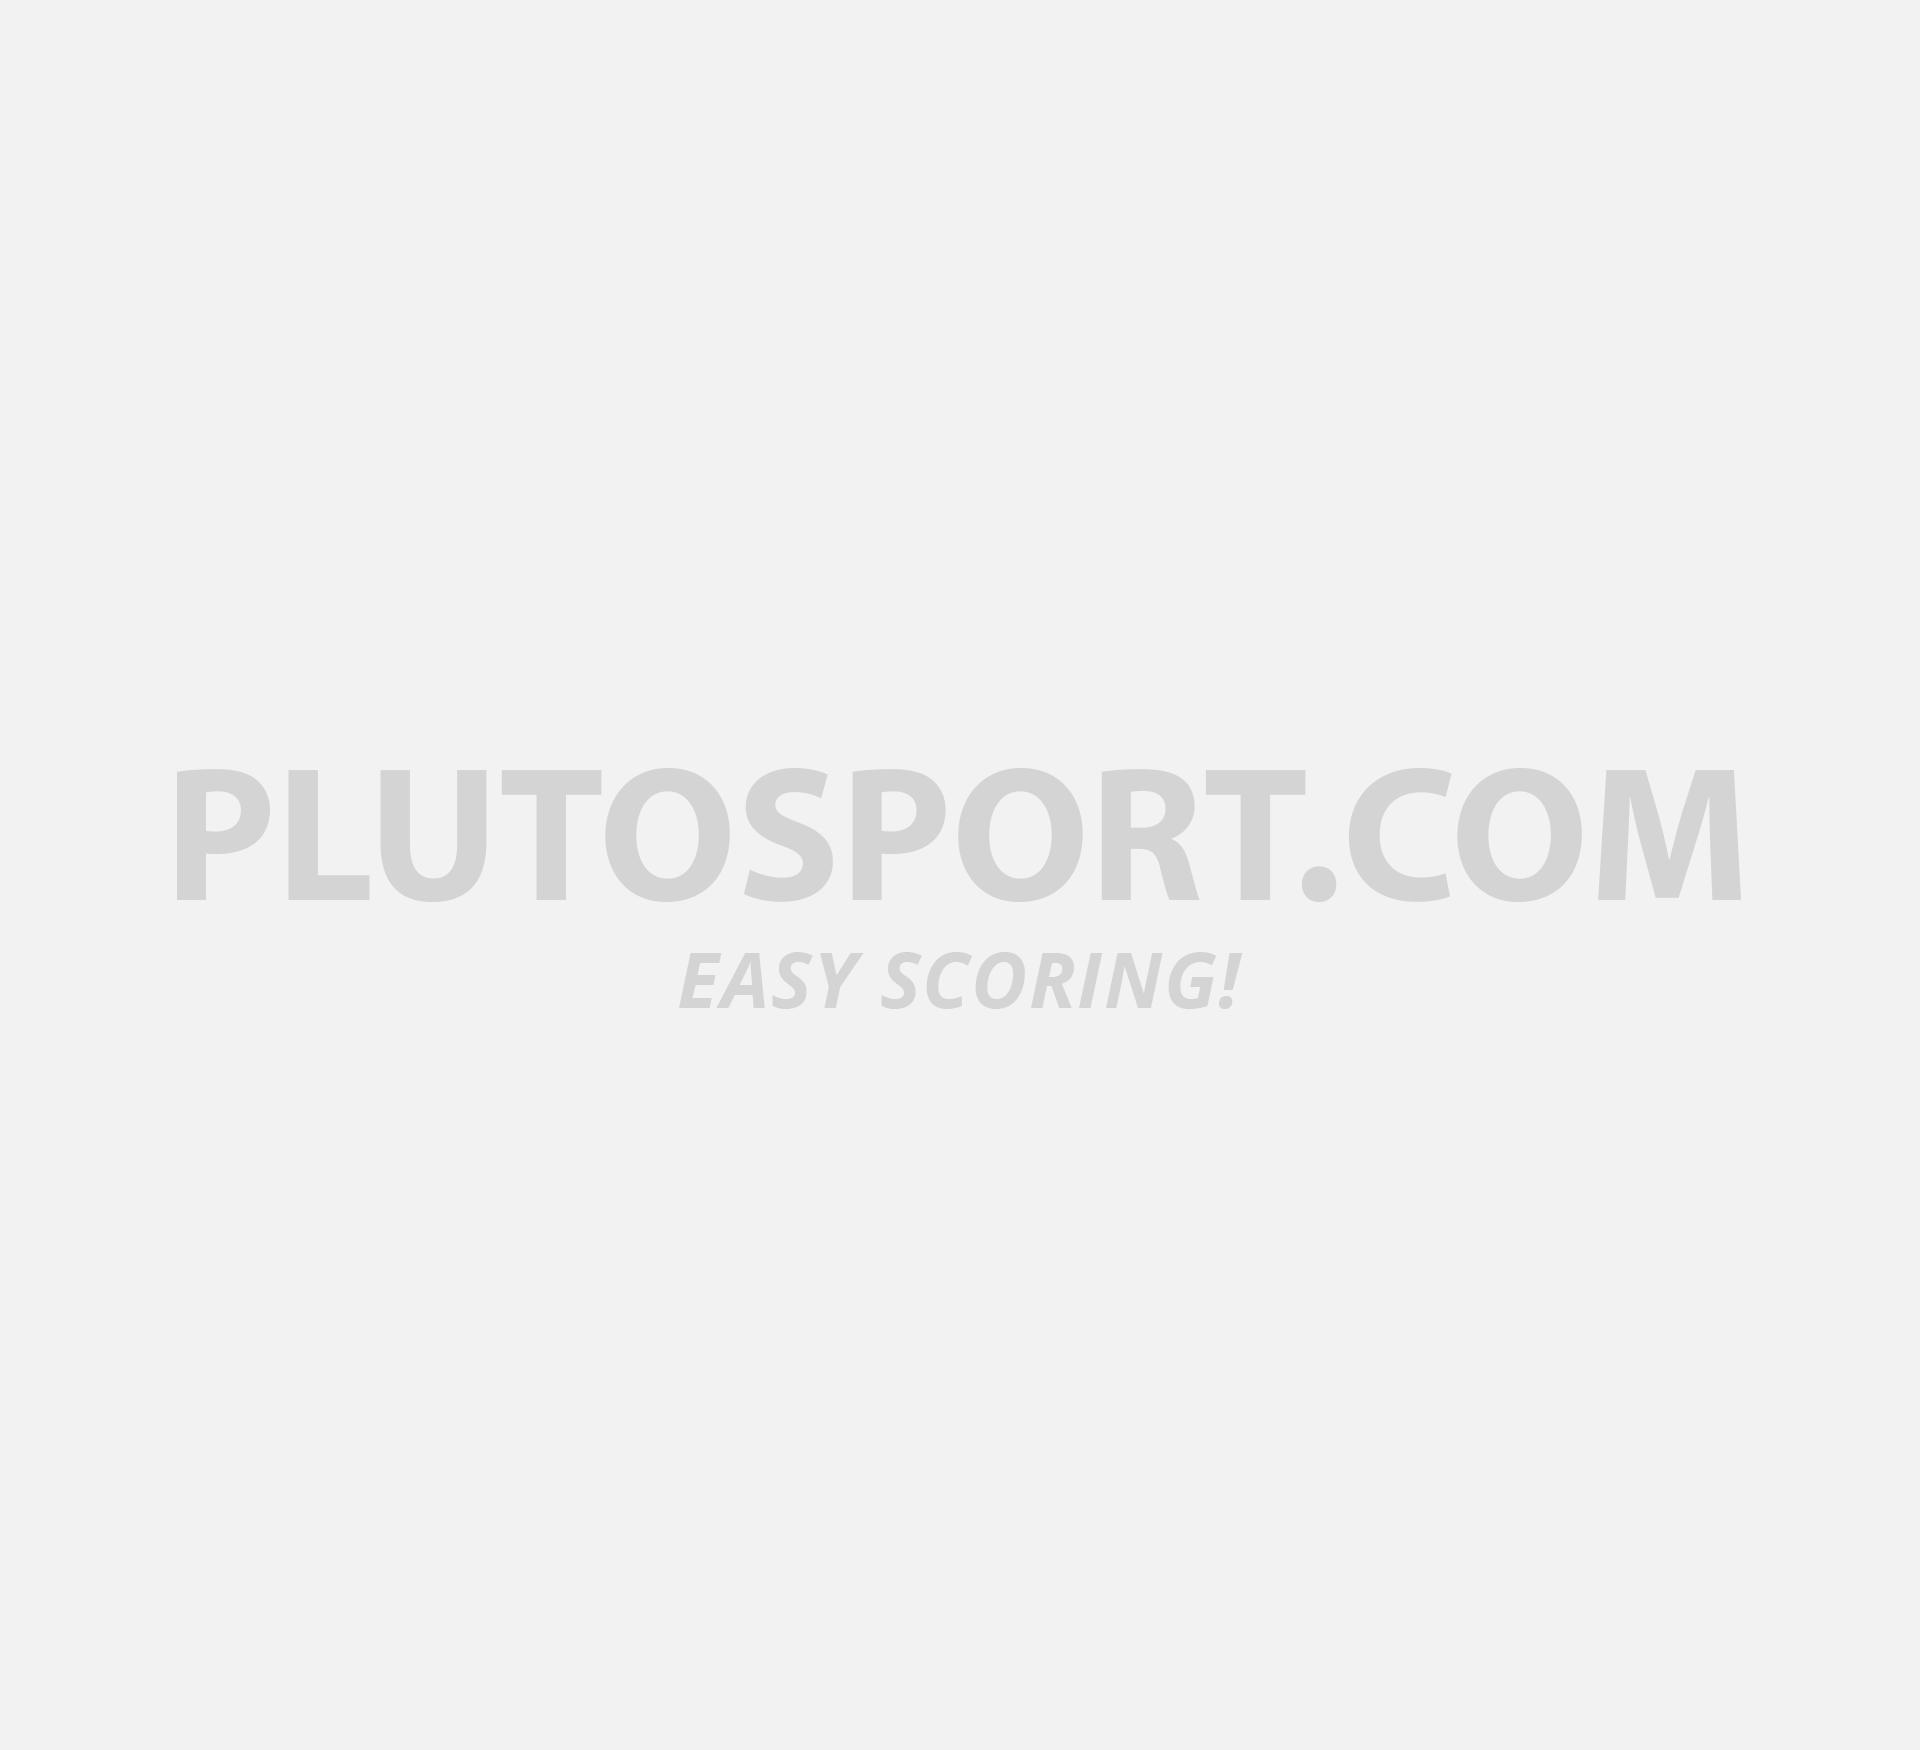 fc04a8b4b Nike Elite MatchFit HyperVenom Crew Socks - Socks - Clothing - Football -  Sports | Plutosport